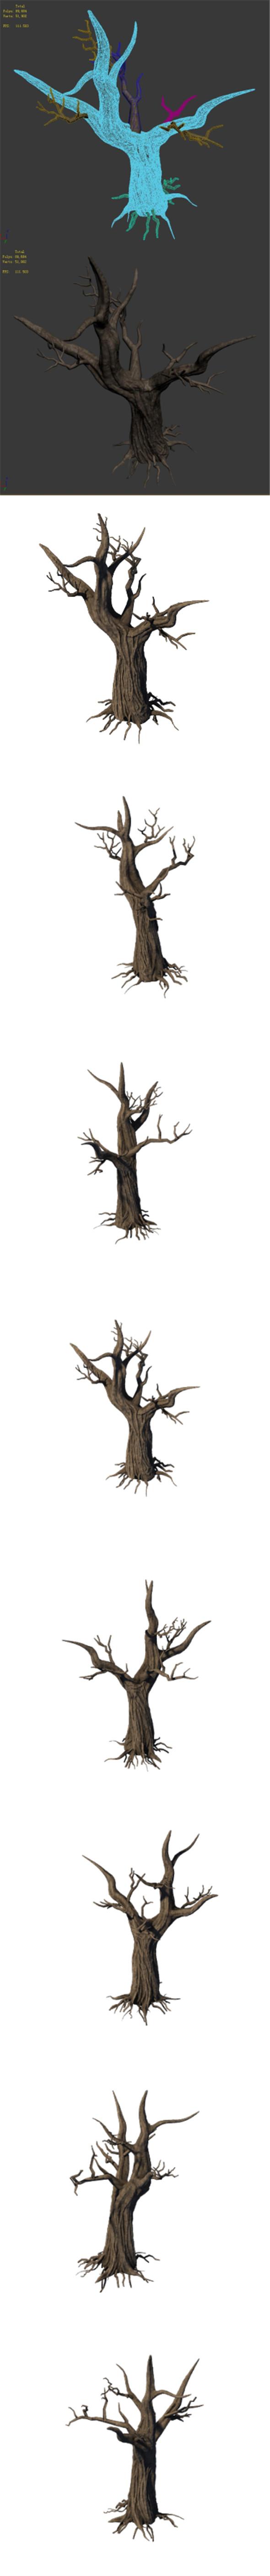 3DOcean General Plant Trees 04 20162329